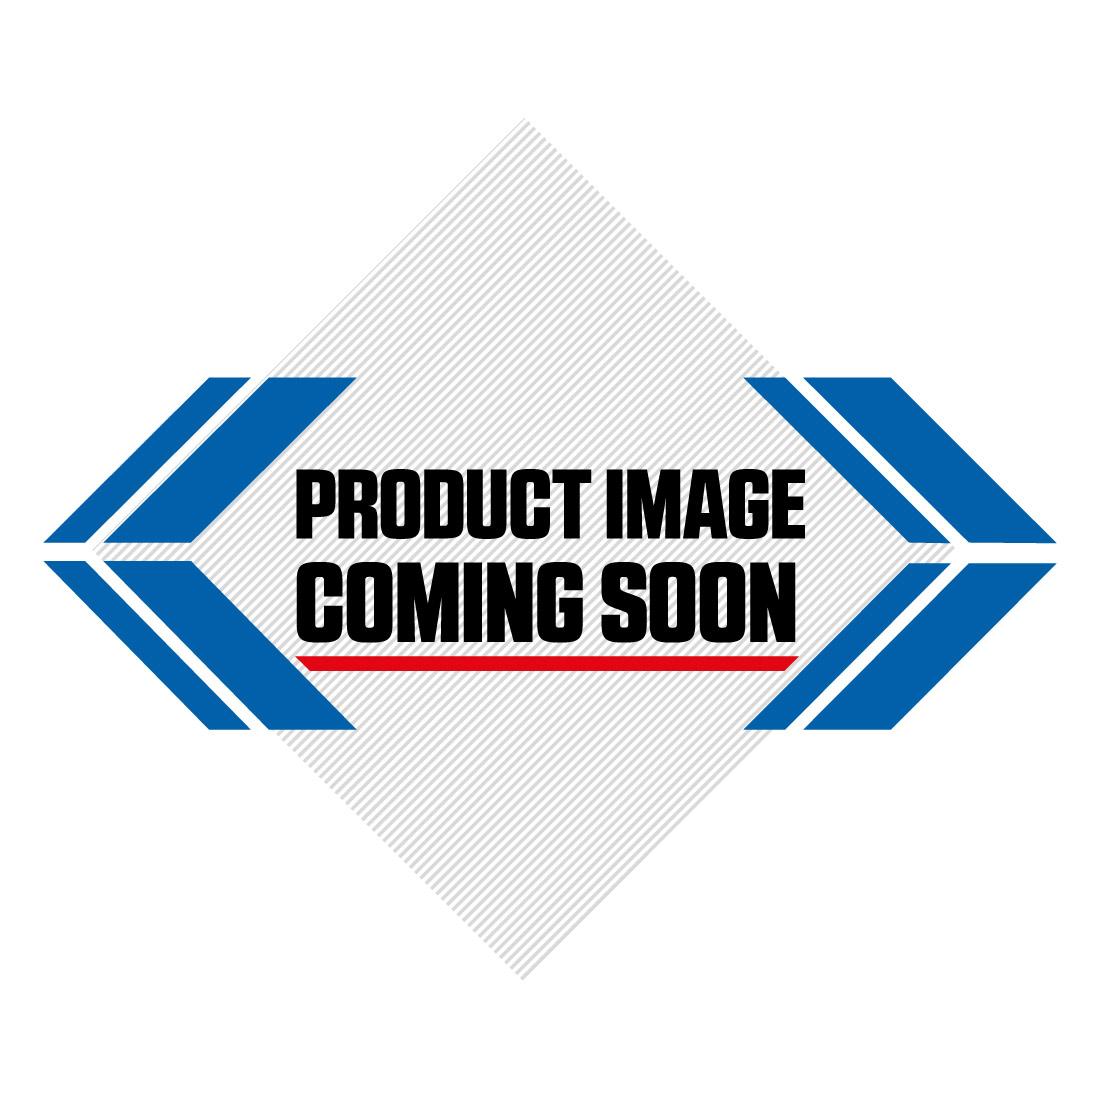 Kawasaki Restyled Plastic Kit KX 85 (2010) OEM Factory Image-4